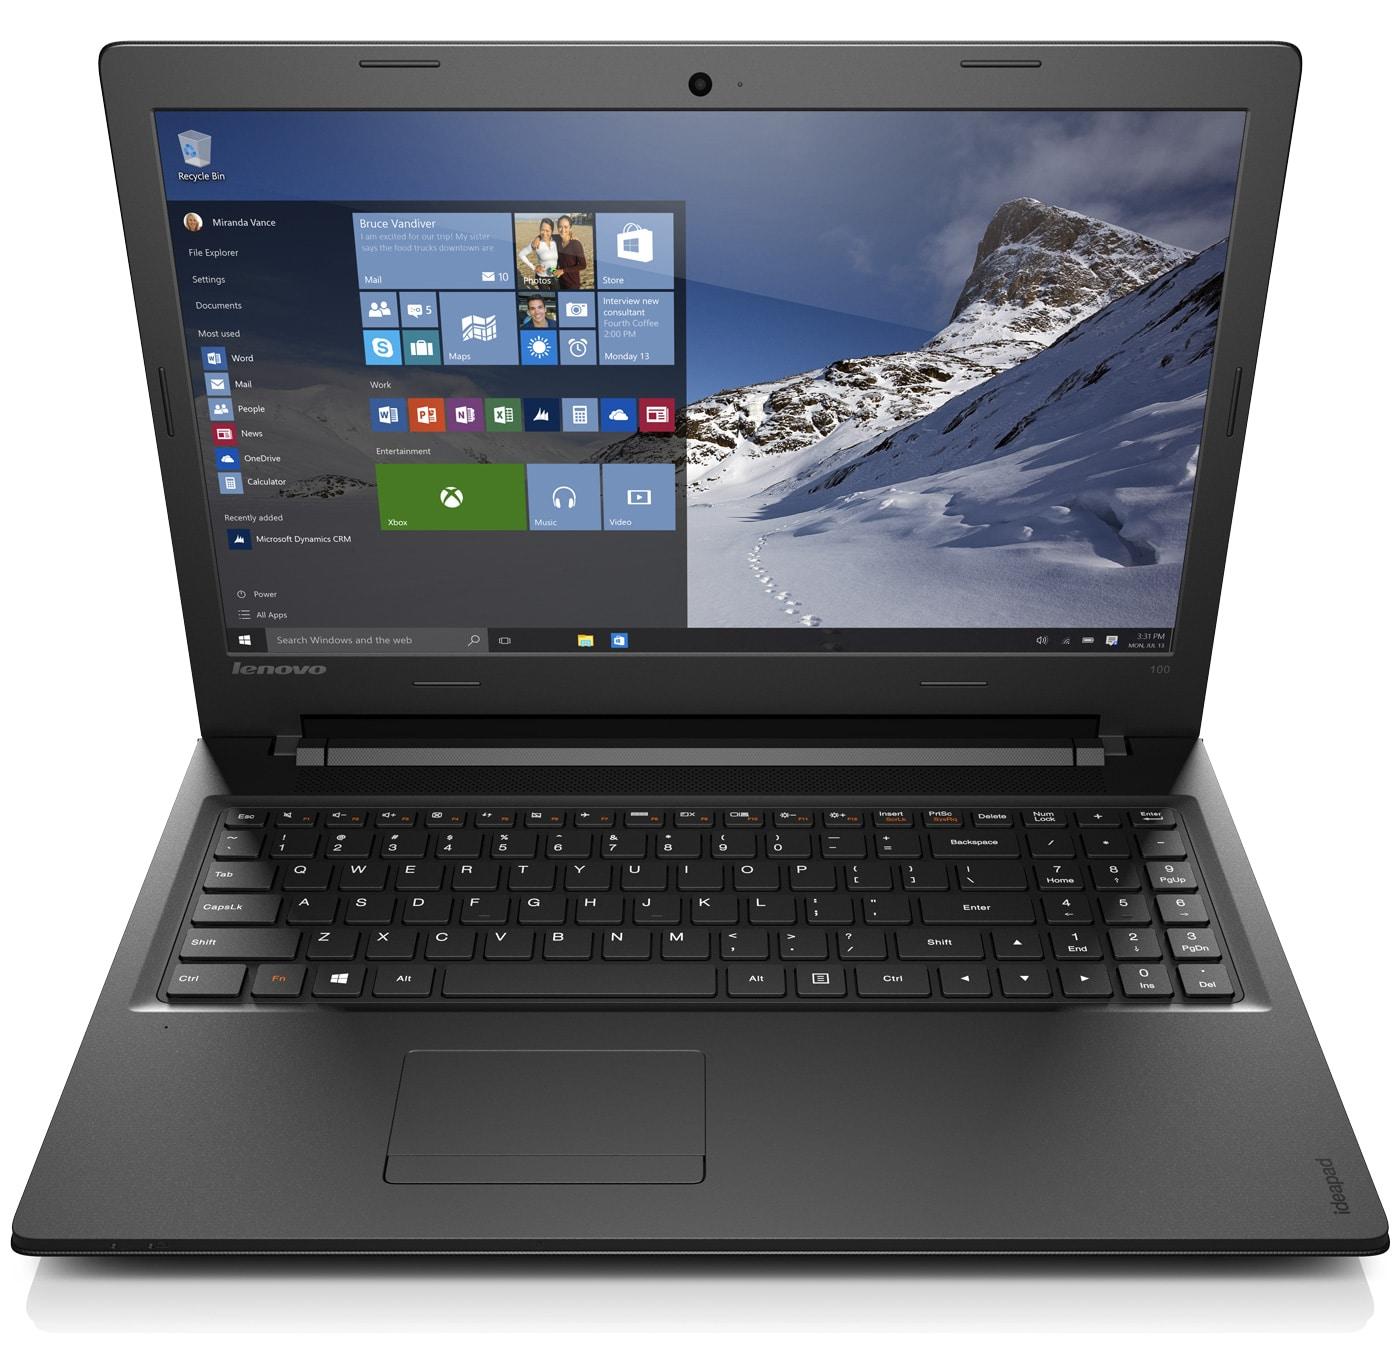 Lenovo IdeaPad 100-15IBD, PC portable 15 pouces Core i5 920M à 499€